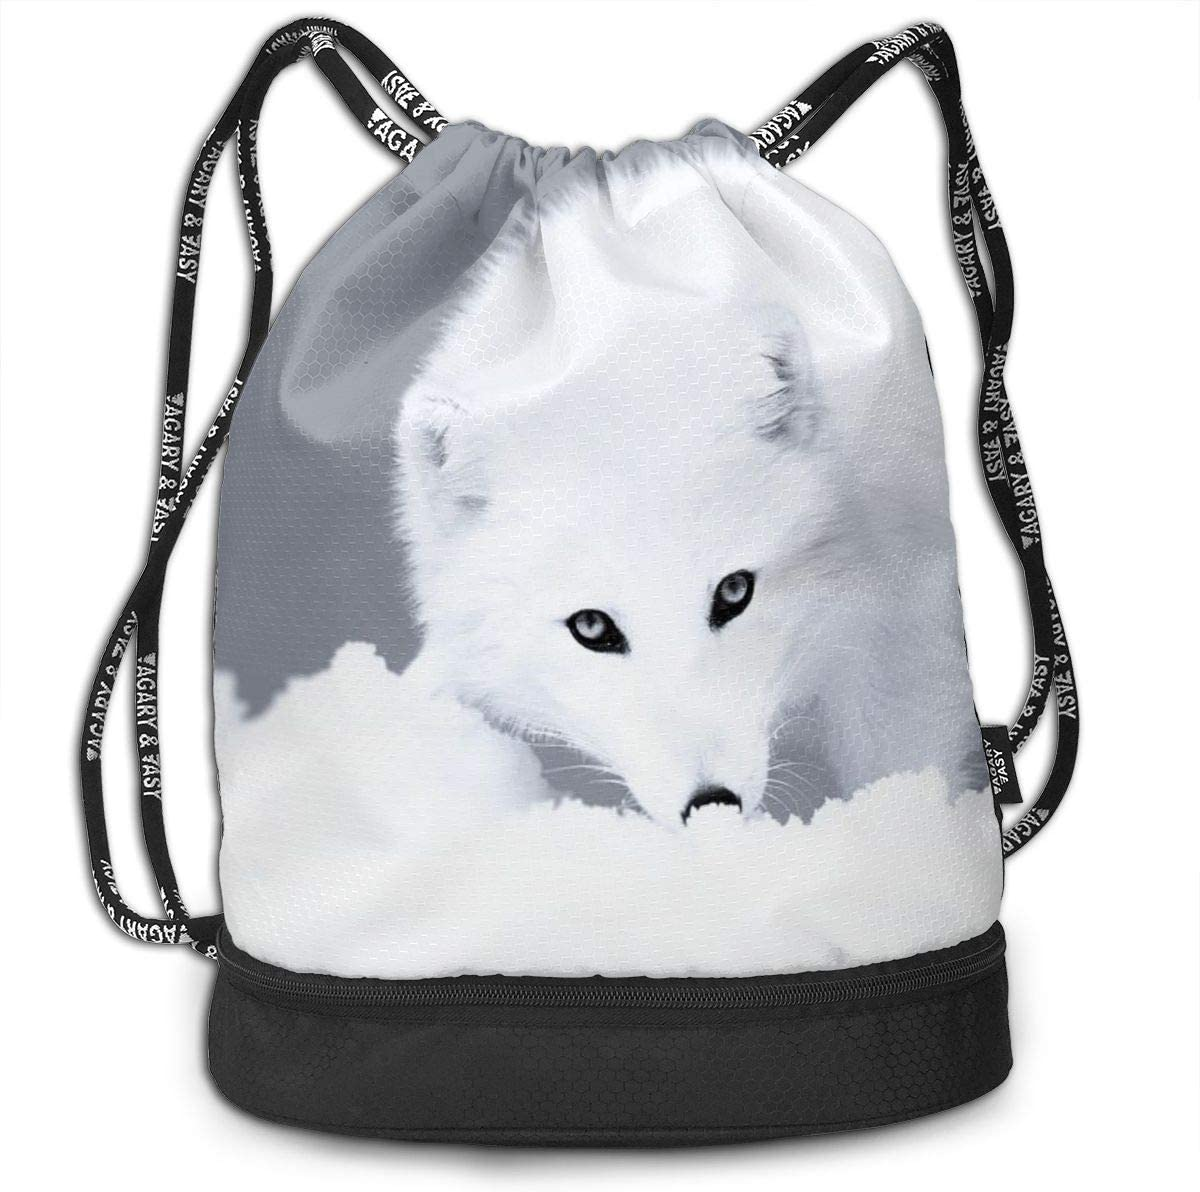 GymSack Drawstring Bag Sackpack White Fox Sport Cinch Pack Simple Bundle Pocke Backpack For Men Women